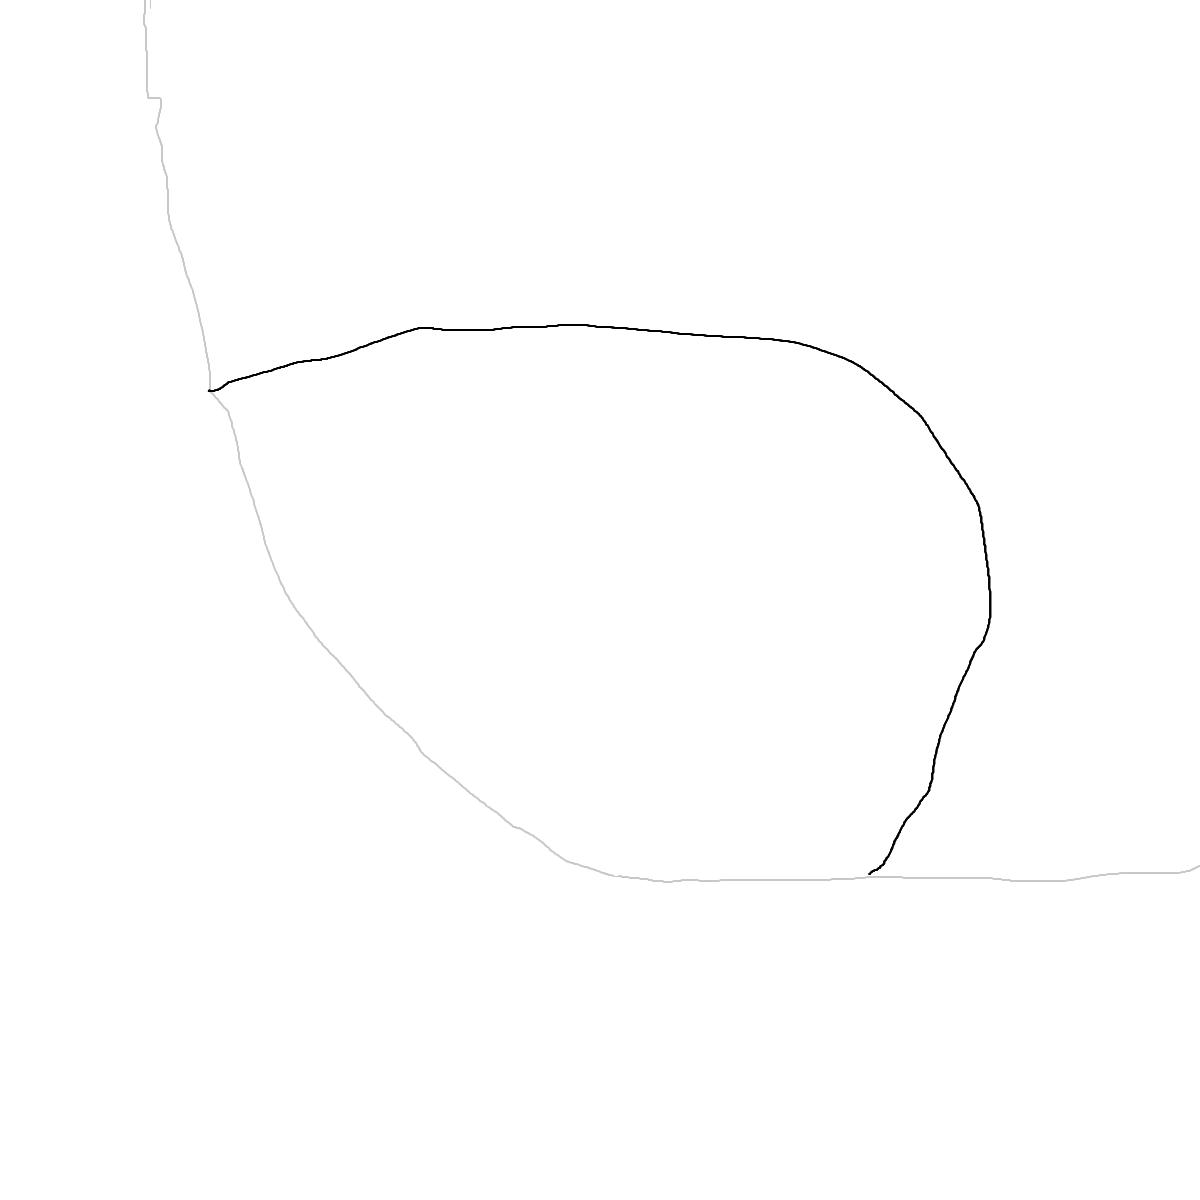 BAAAM drawing#16075 lat:39.0971031188964840lng: -84.5065689086914000